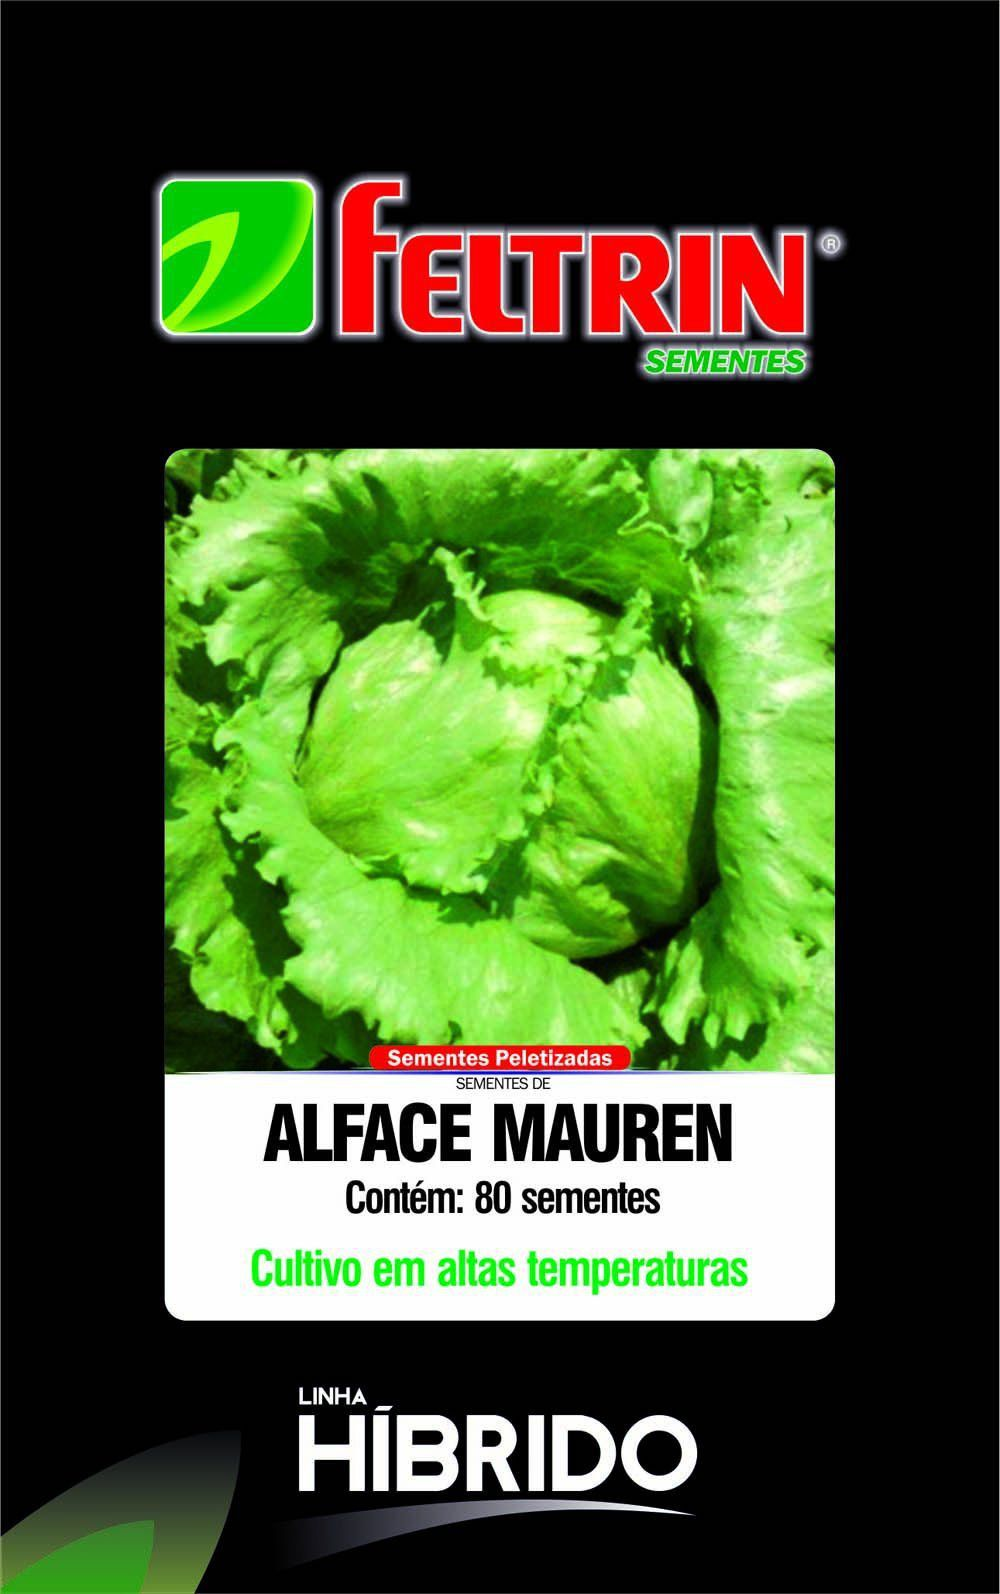 Sementes de Alface Mauren com 80 sementes - Feltrin Linha Híbrido